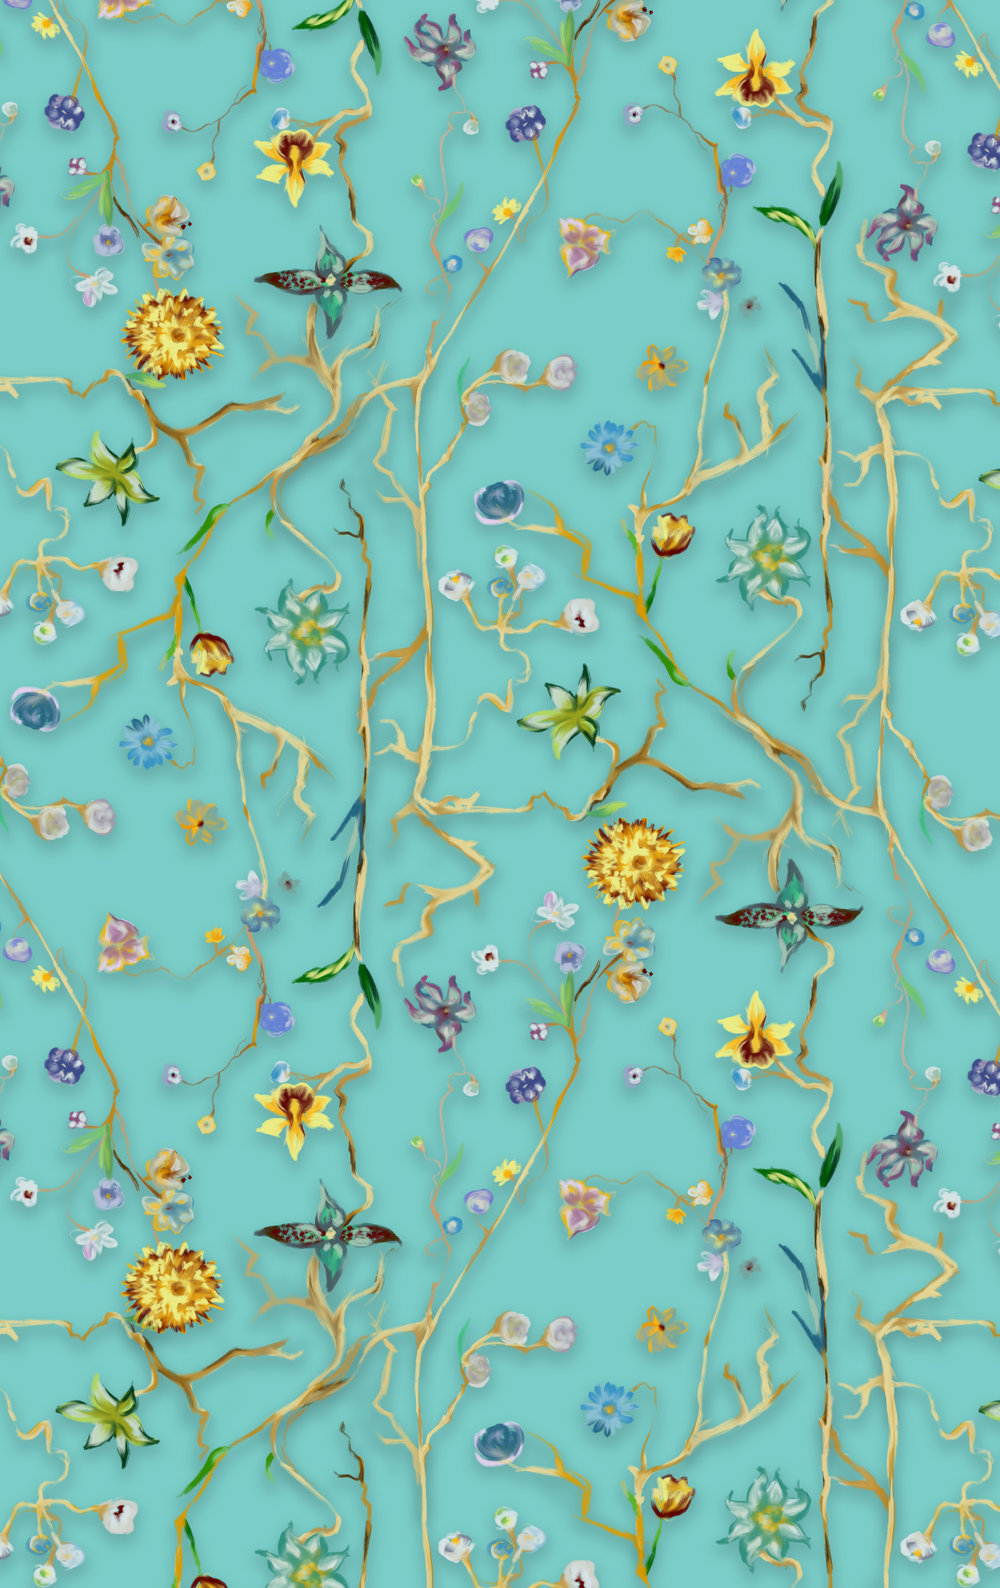 wall of flowers - blue.jpg